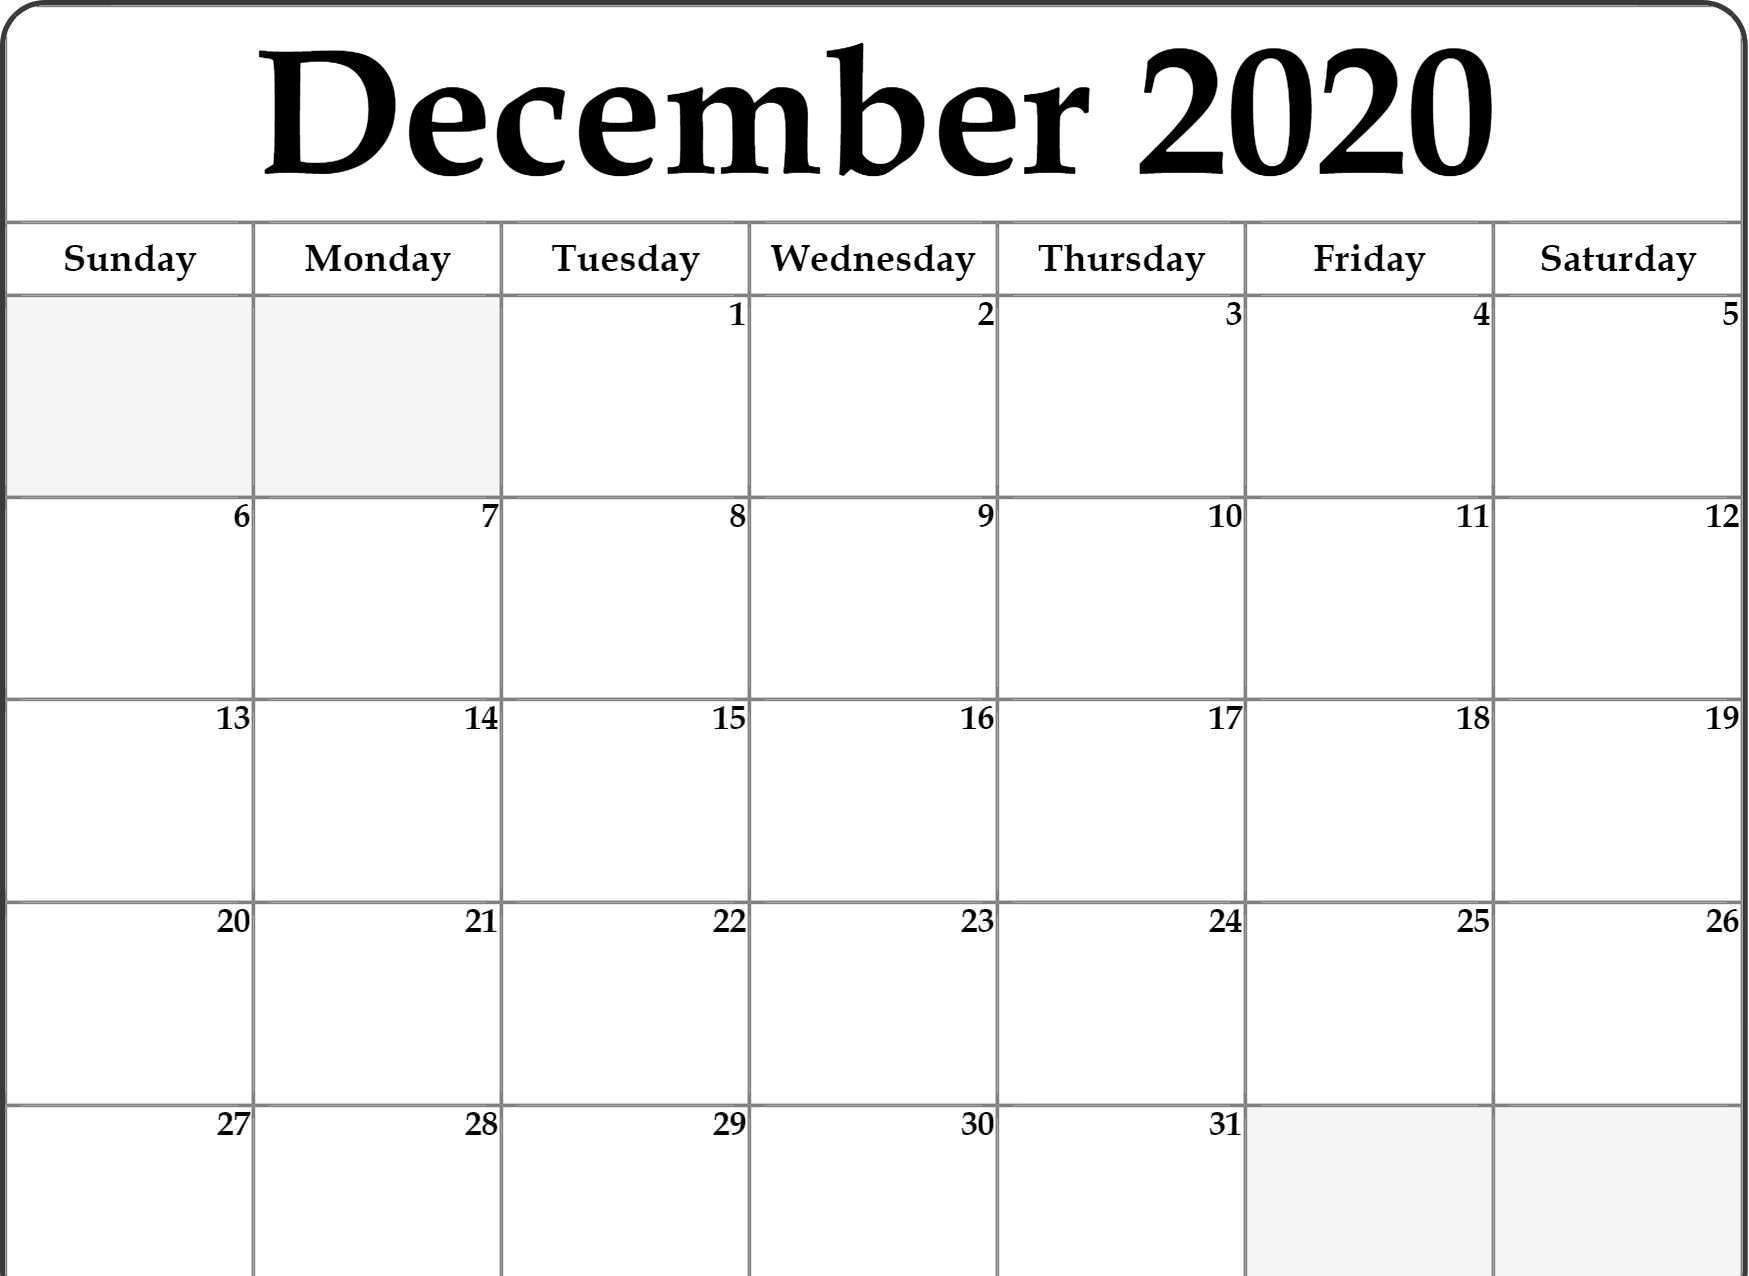 December 2020 Calendar Wallpapers  Top Free December 2020 for Calander December 2020